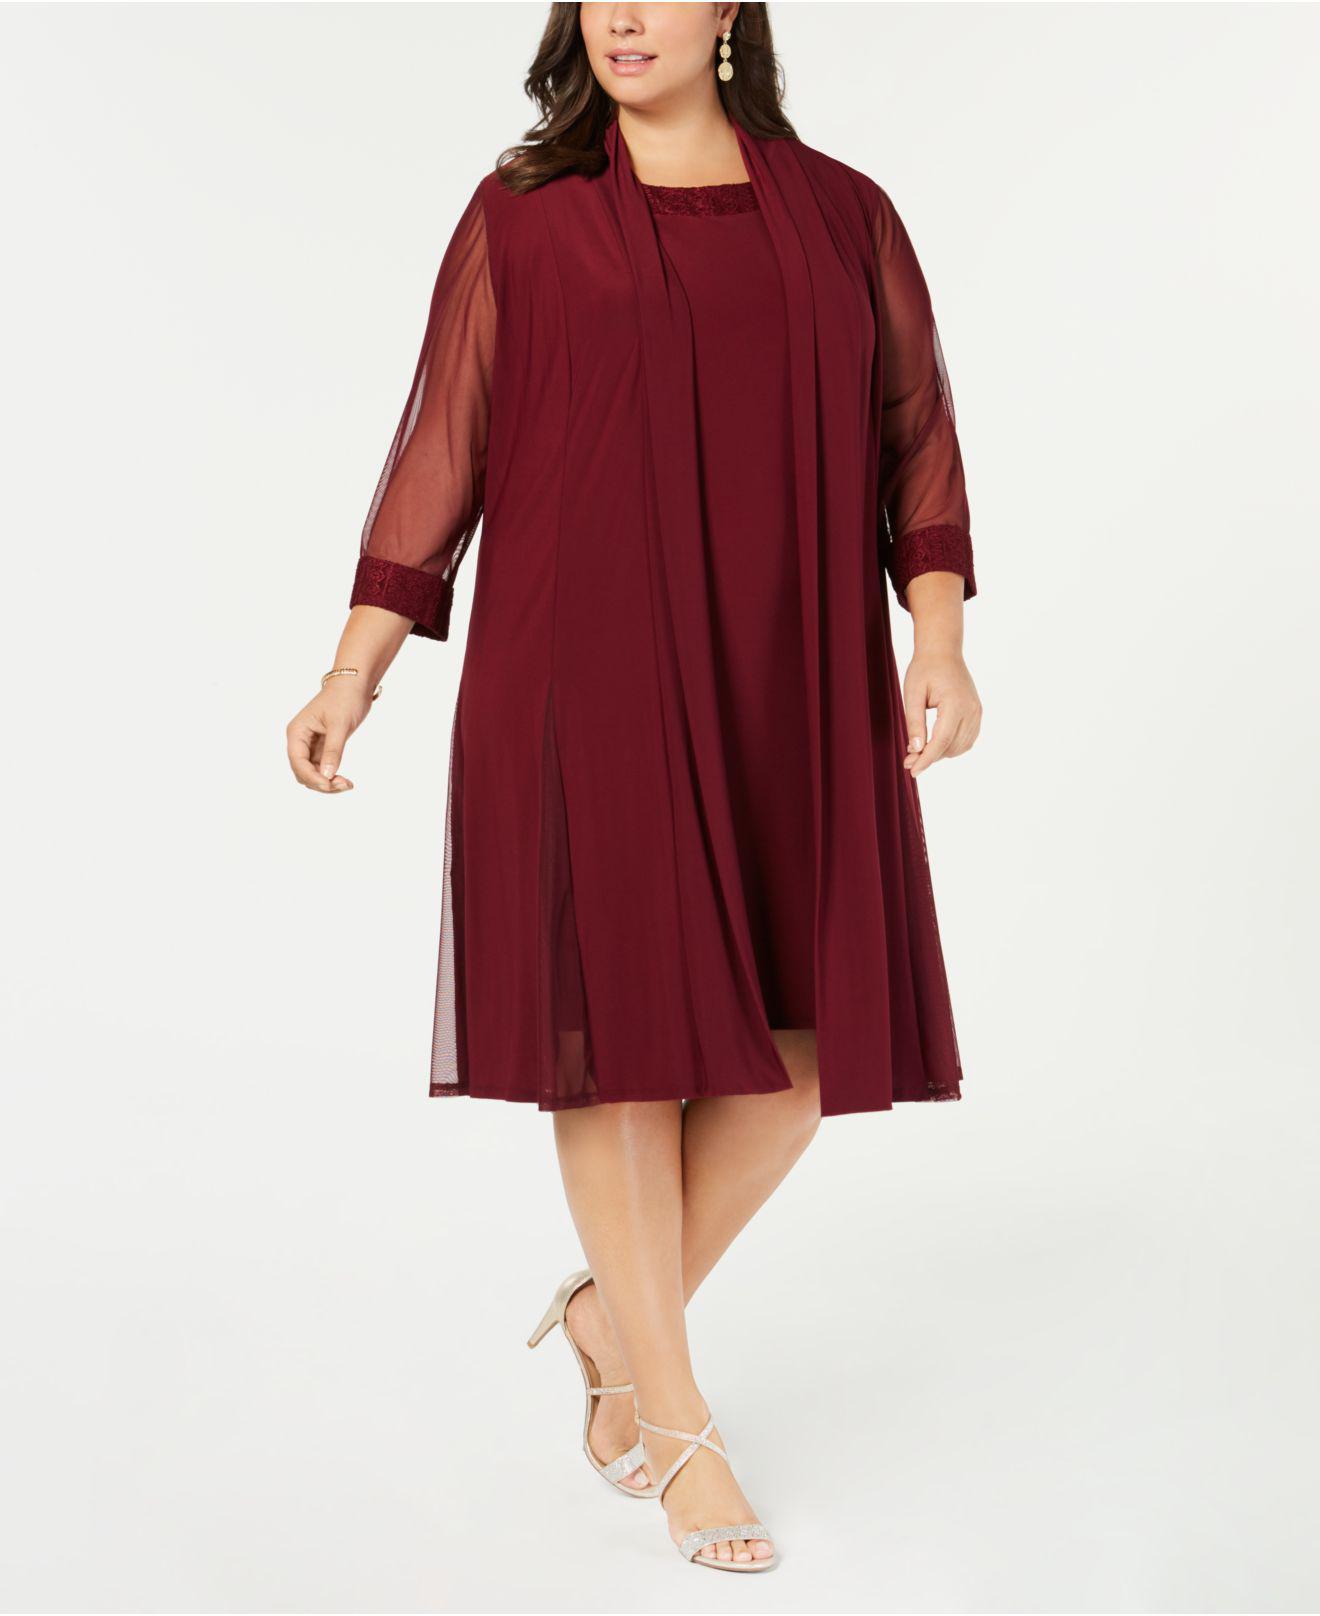 fe1e49d1e40bc R   M Richards Plus-size Embellished Dress   Jacket Set in Red - Lyst